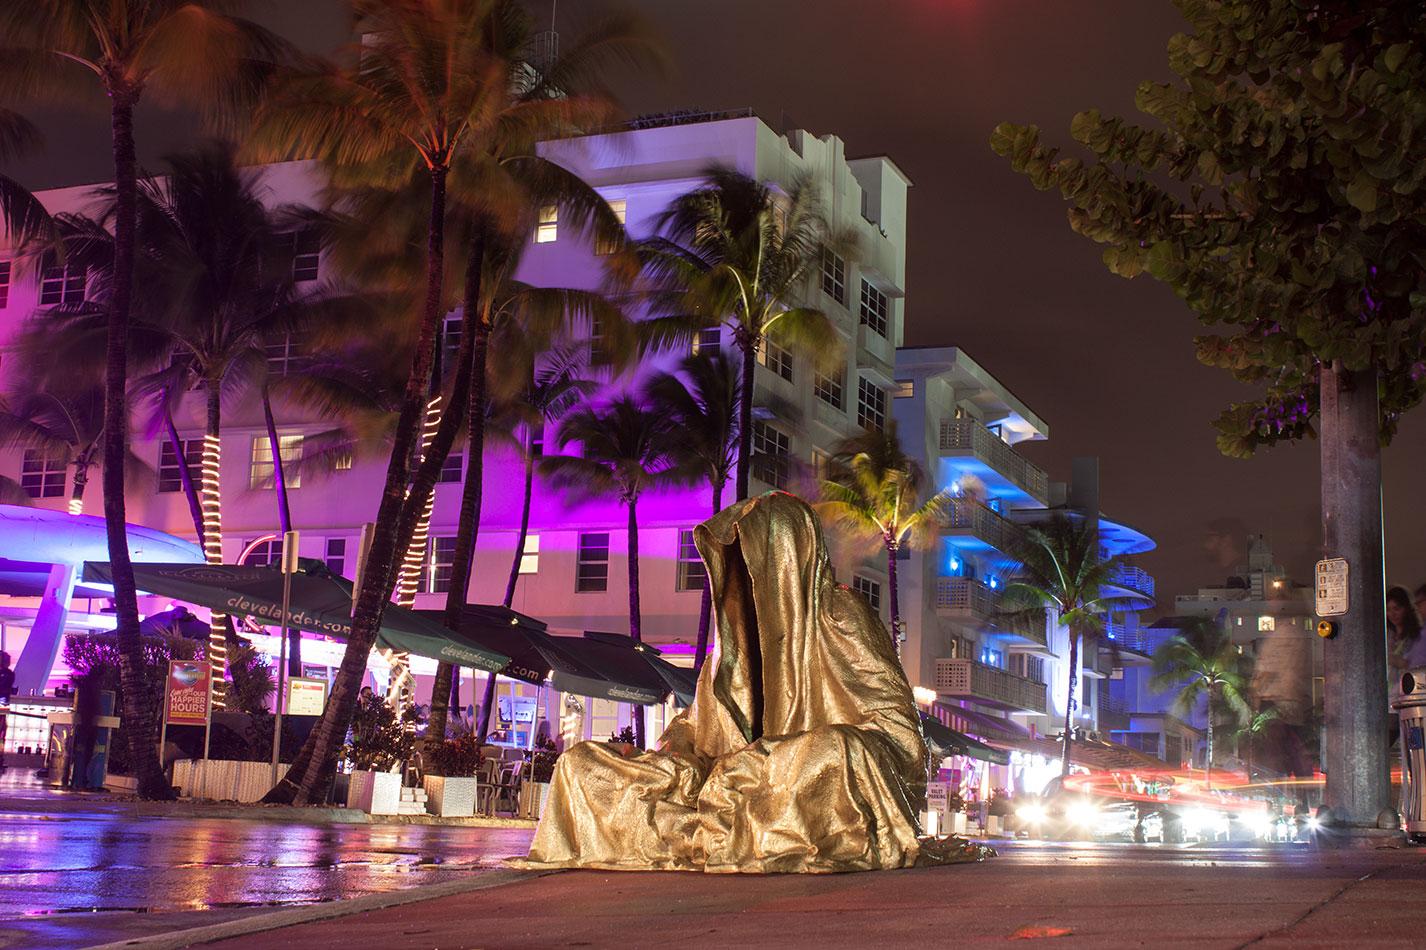 public-art-basel-miami-beach-fair-usa-florida-bass-museum-guardians-of-time-manfred-kili-kielnhofer-contemporary-fine-art-modern-arts-design-antiques-sculpture-6626